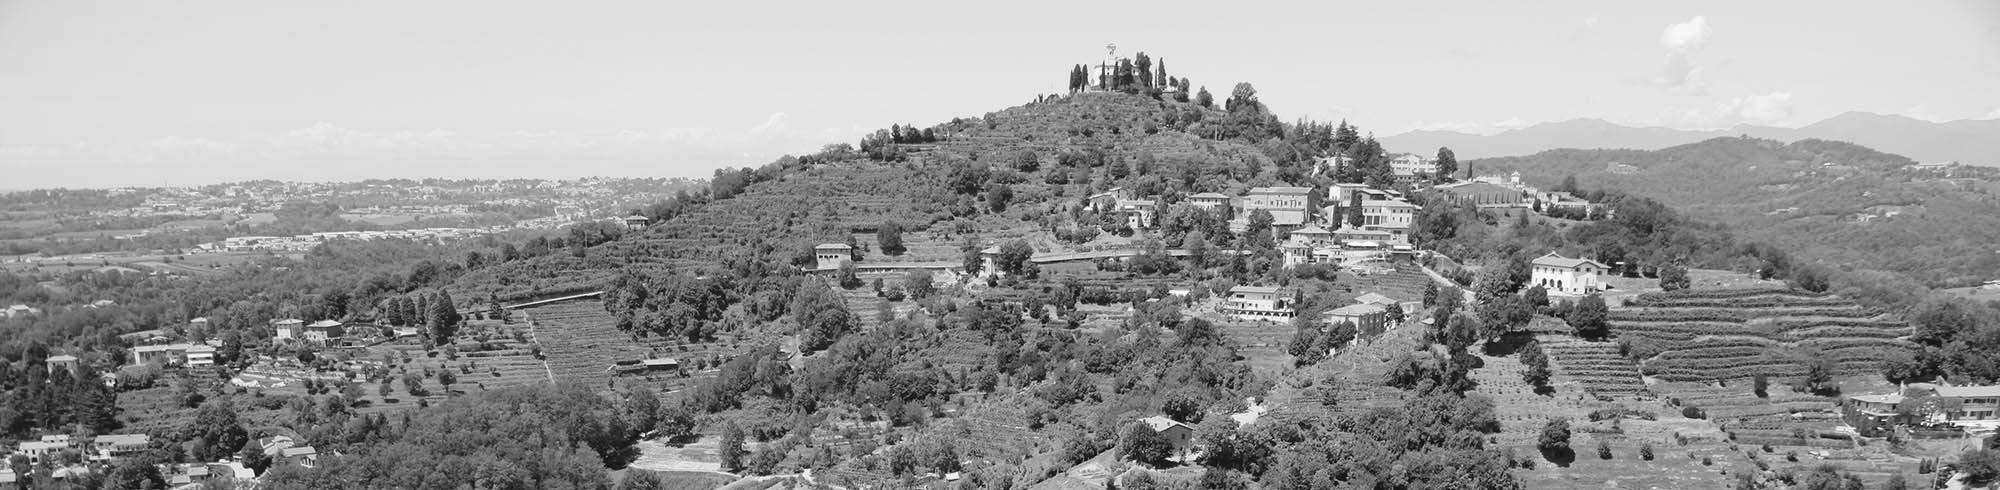 Stunning Agriturismo Le Terrazze Montevecchia Images - Idee ...